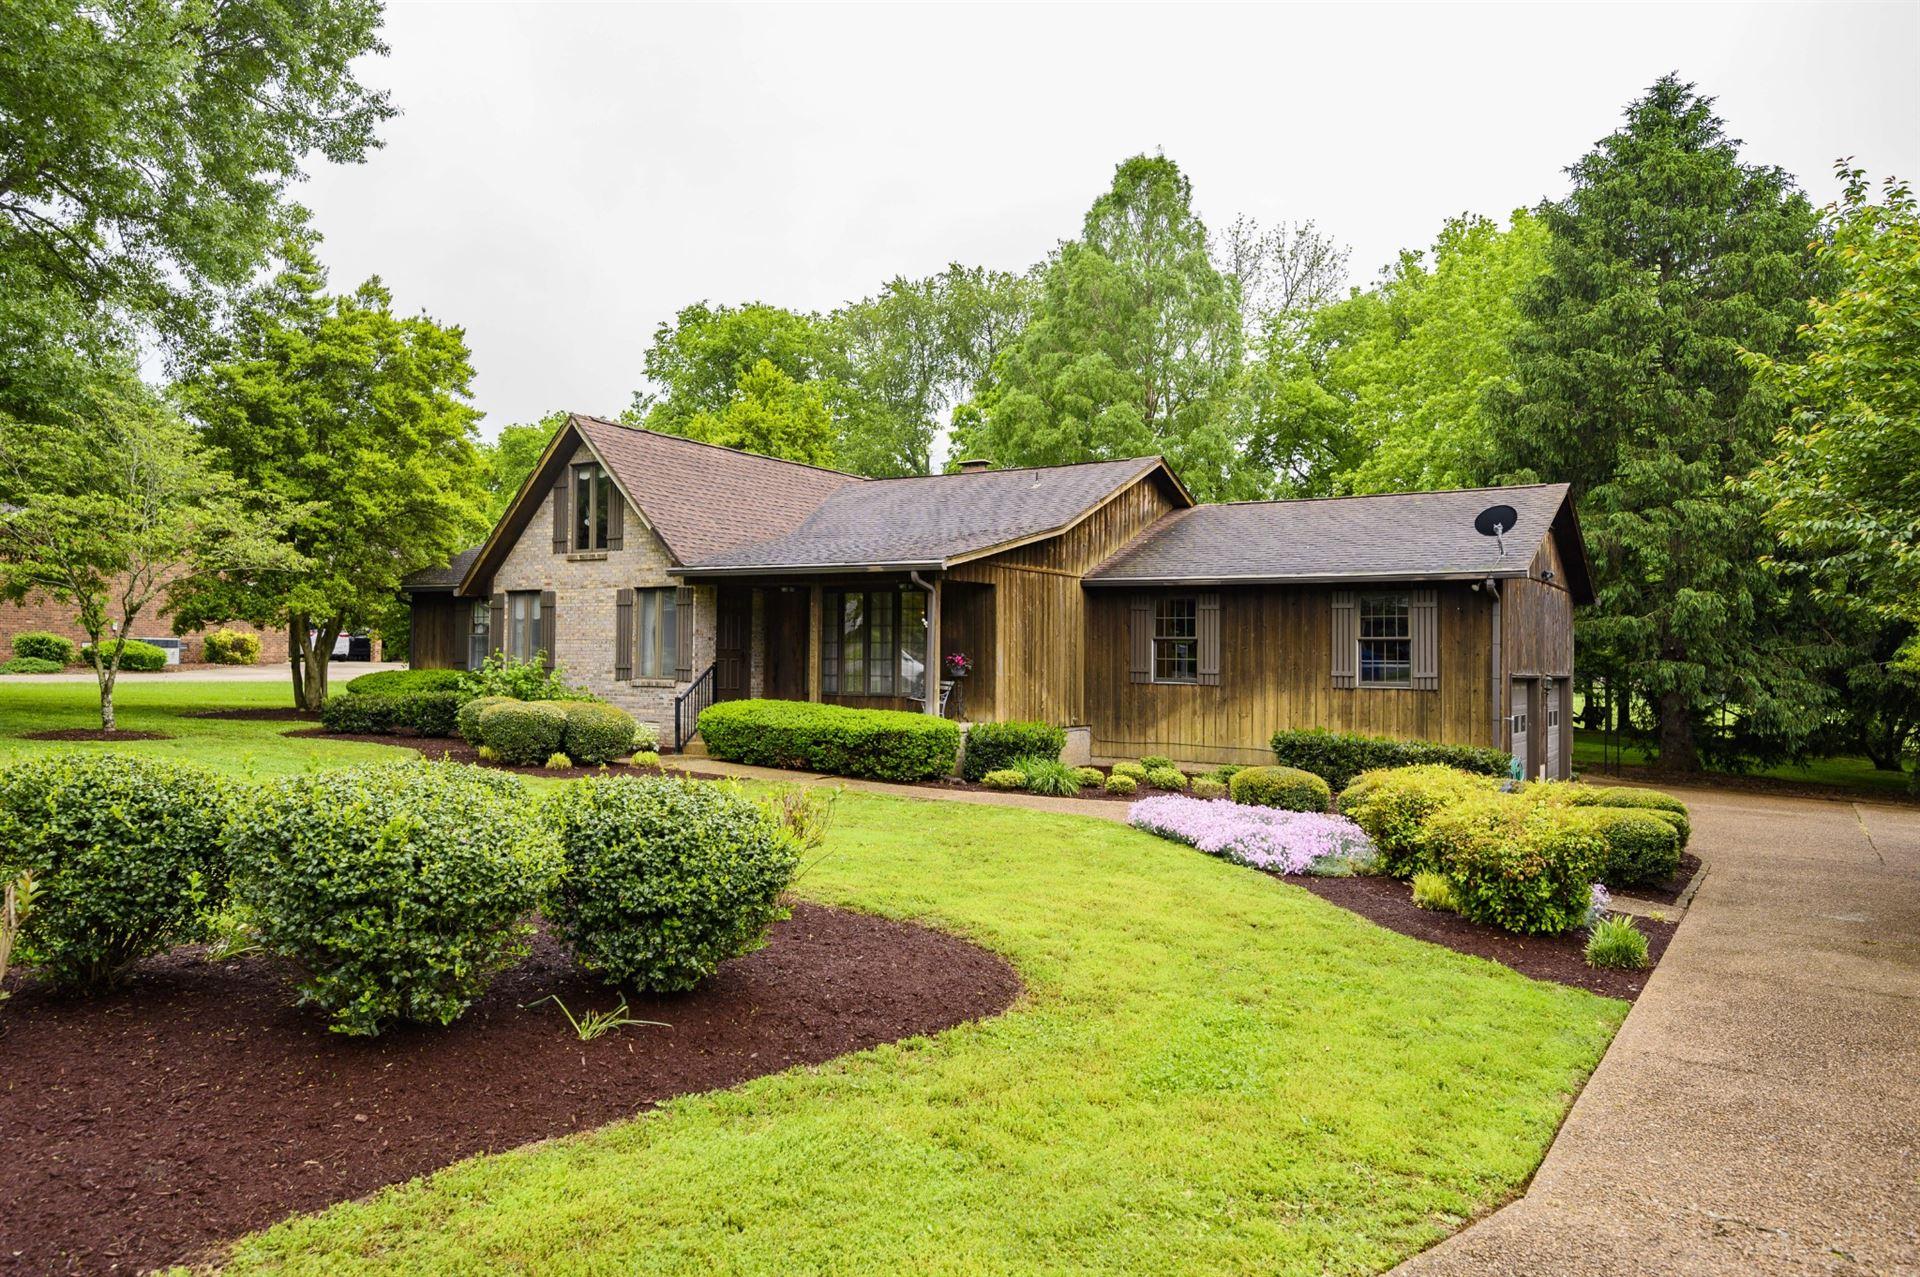 3503 Meadowwood Dr, Murfreesboro, TN 37128 - MLS#: 2251049